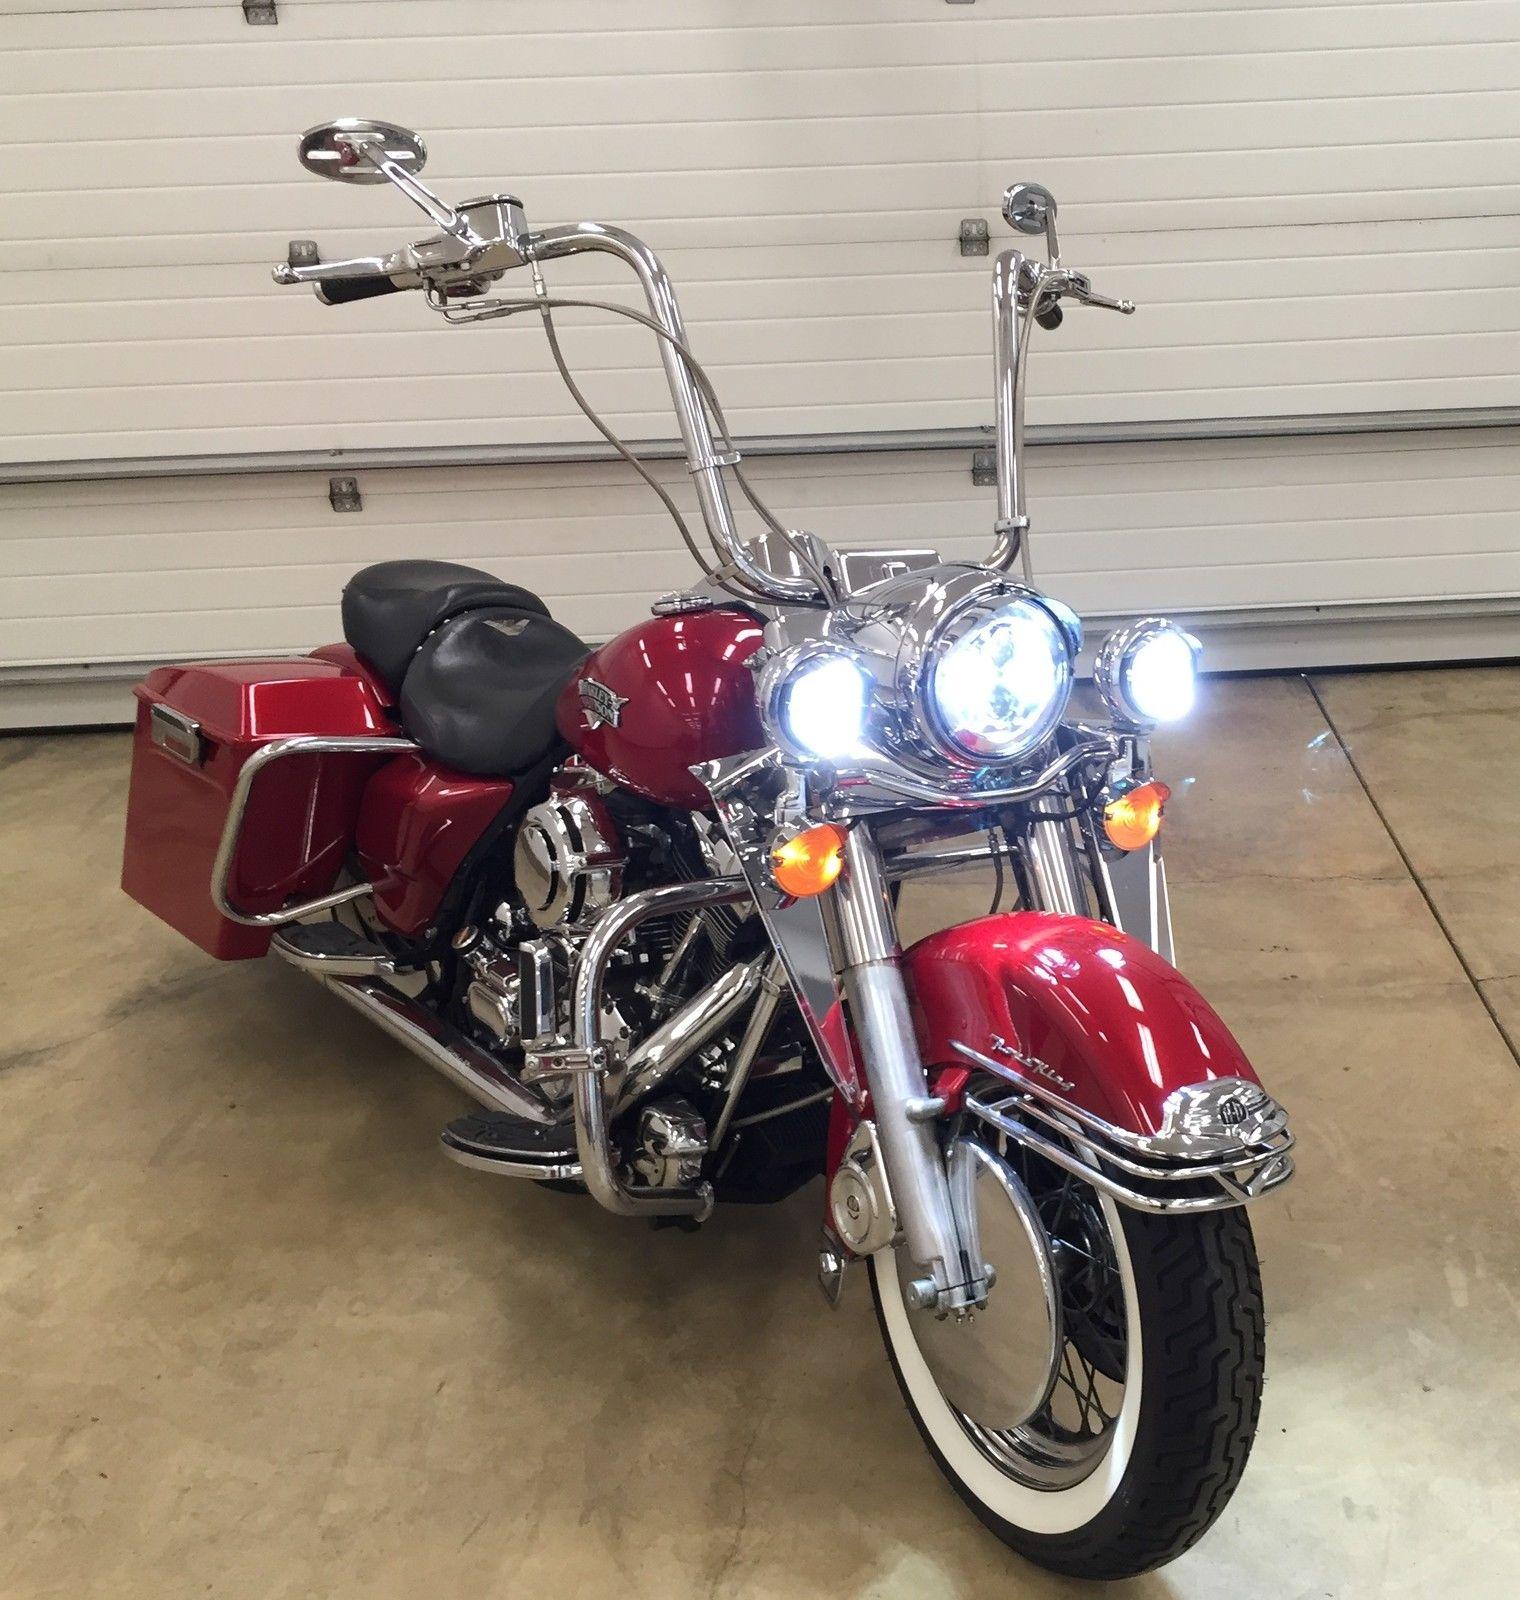 2000 Harley Davidson Flhr Road King  Leds Lights  Stretched Bags  Air Ride  Etc